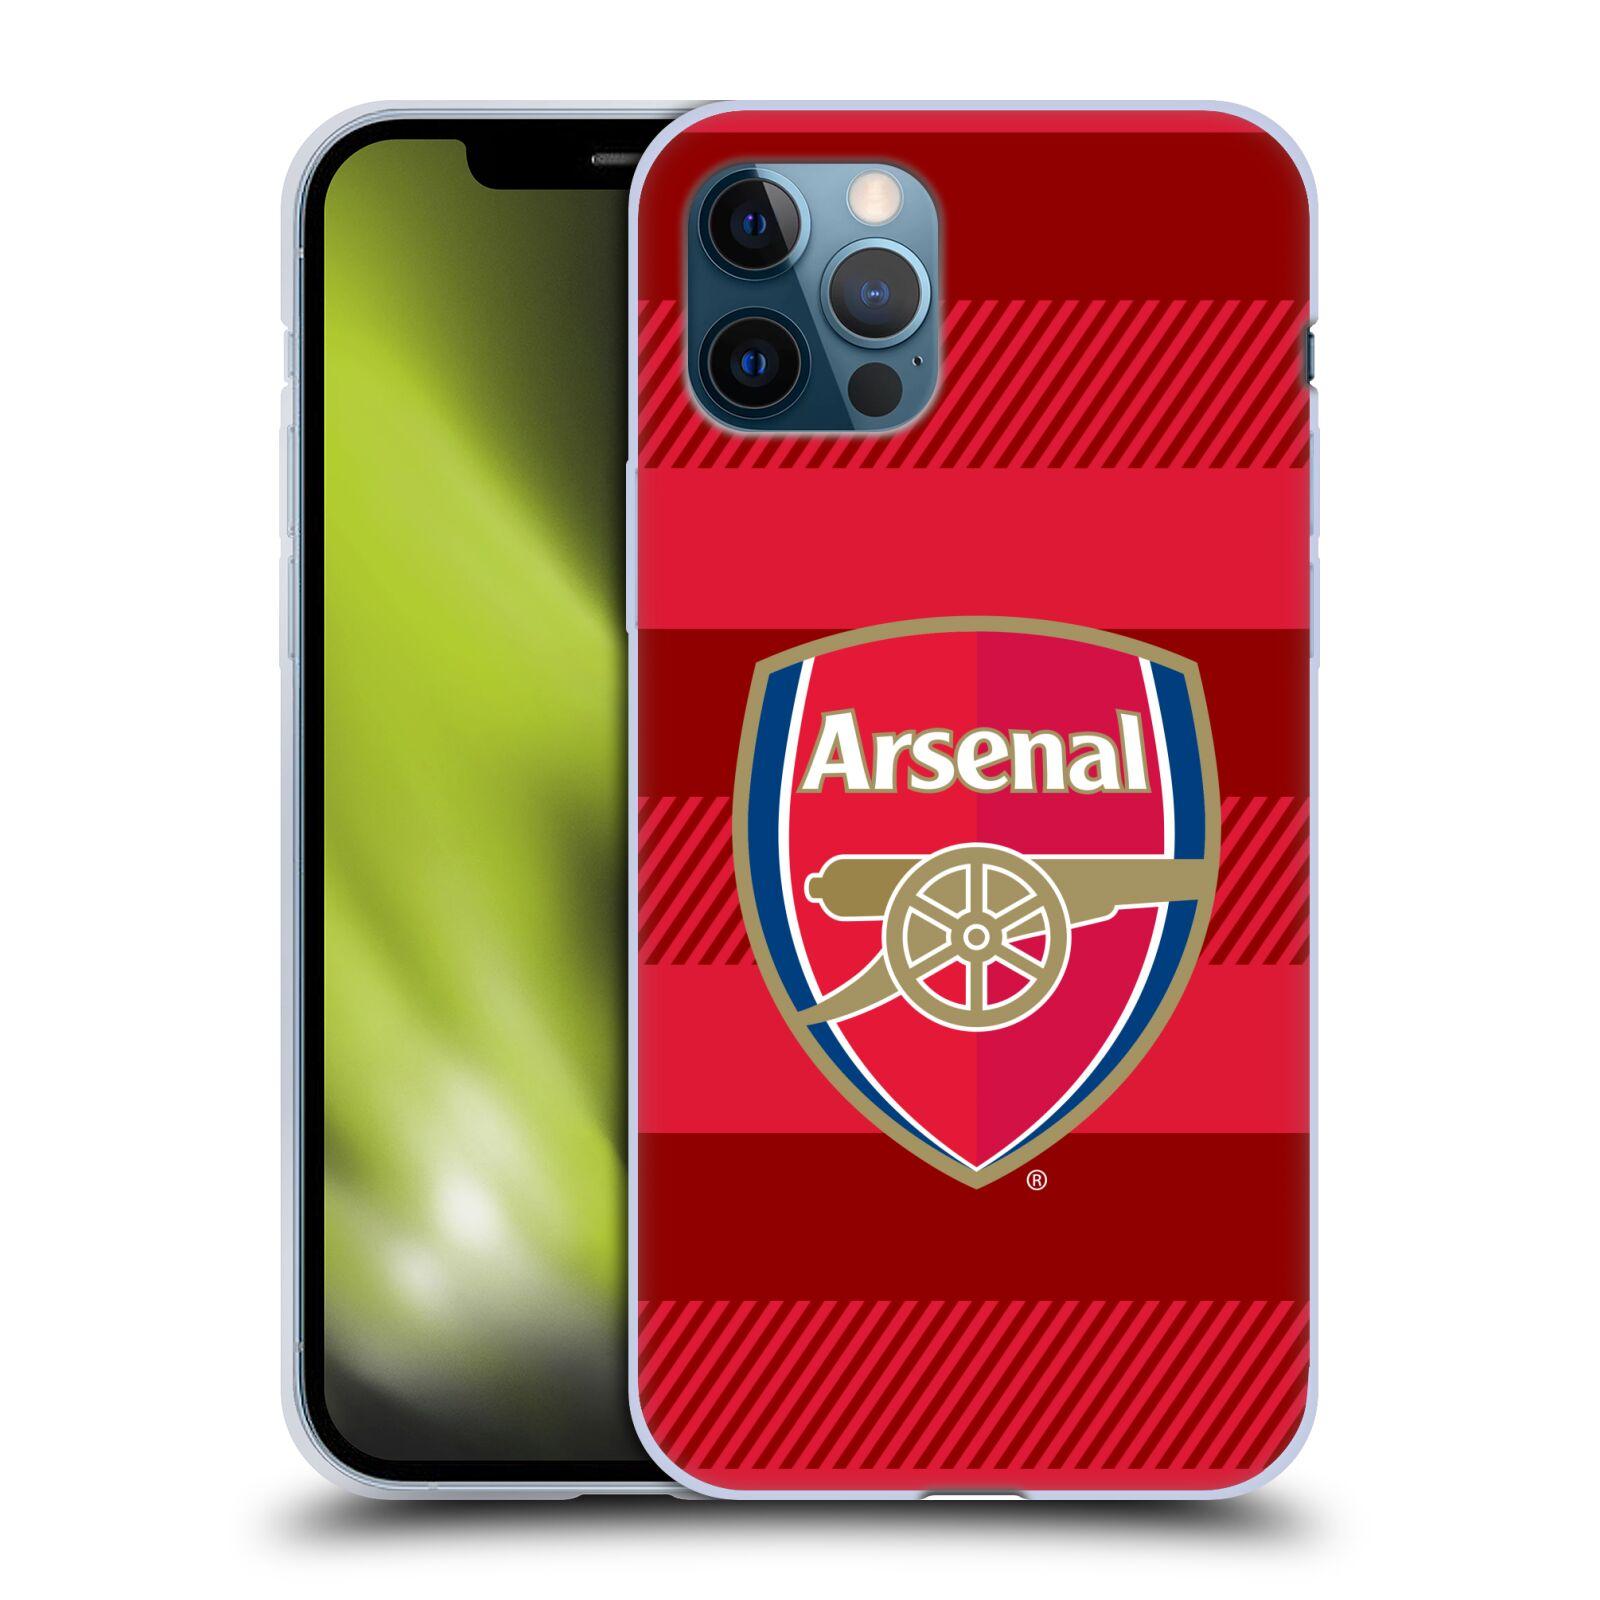 Silikonové pouzdro na mobil Apple iPhone 12 / 12 Pro - Head Case - Arsenal FC - Logo s pruhy